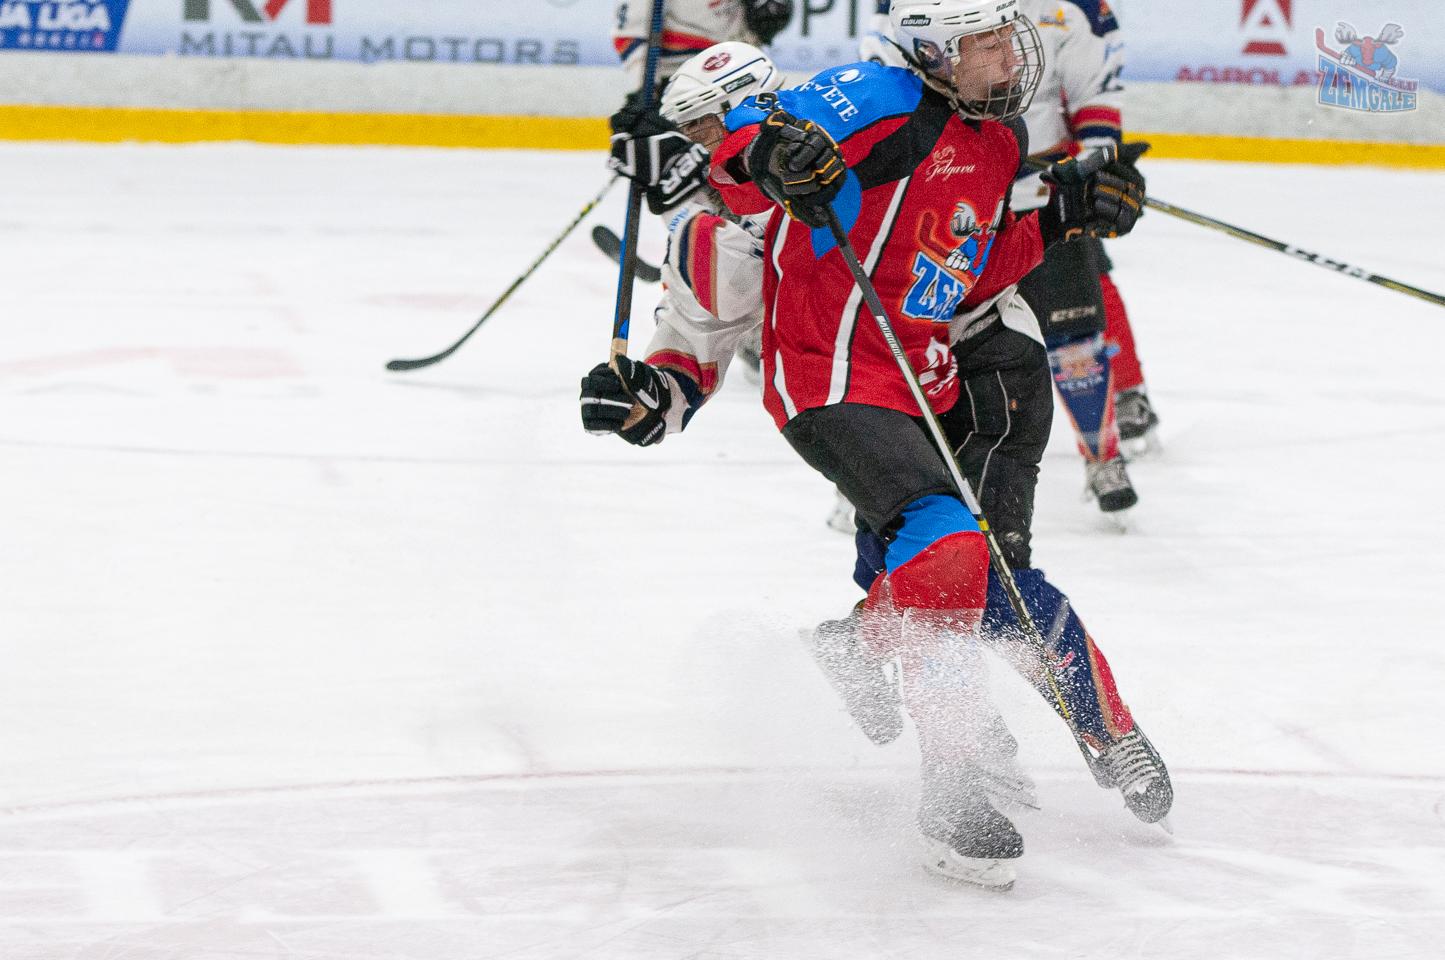 Jelgavas hokeja skola JLSS U17 - Venta 2002 14092019-18